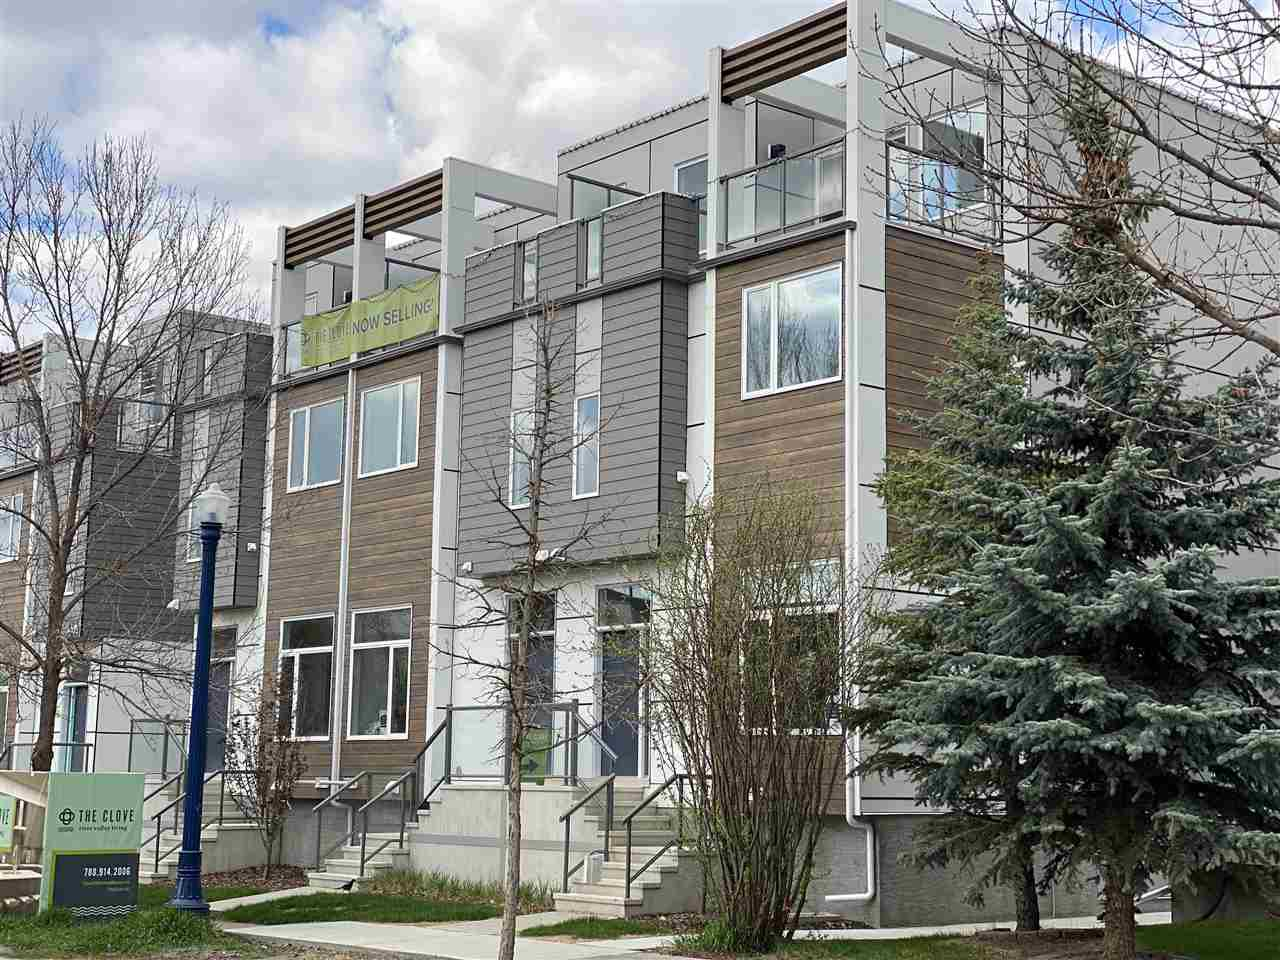 Main Photo: 2 9745 92 Street in Edmonton: Zone 18 Townhouse for sale : MLS®# E4191803